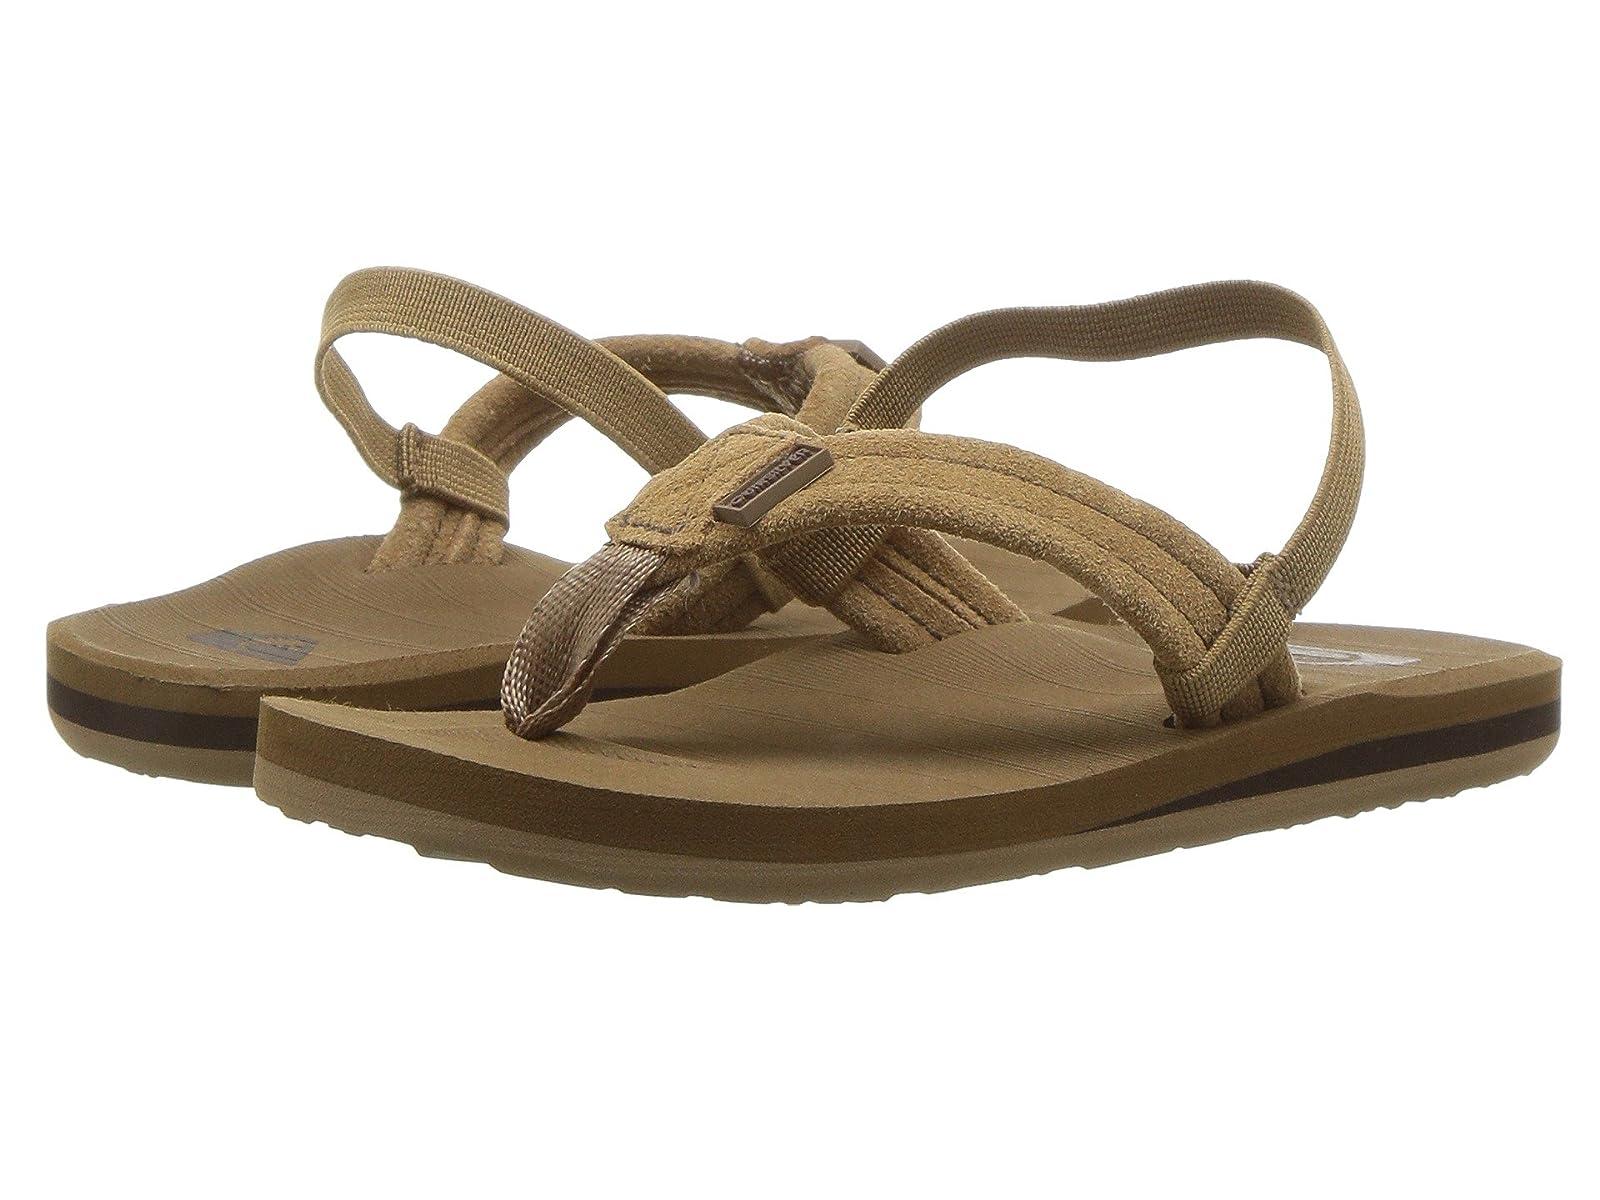 Quiksilver Kids Carver Suede (Toddler)Atmospheric grades have affordable shoes